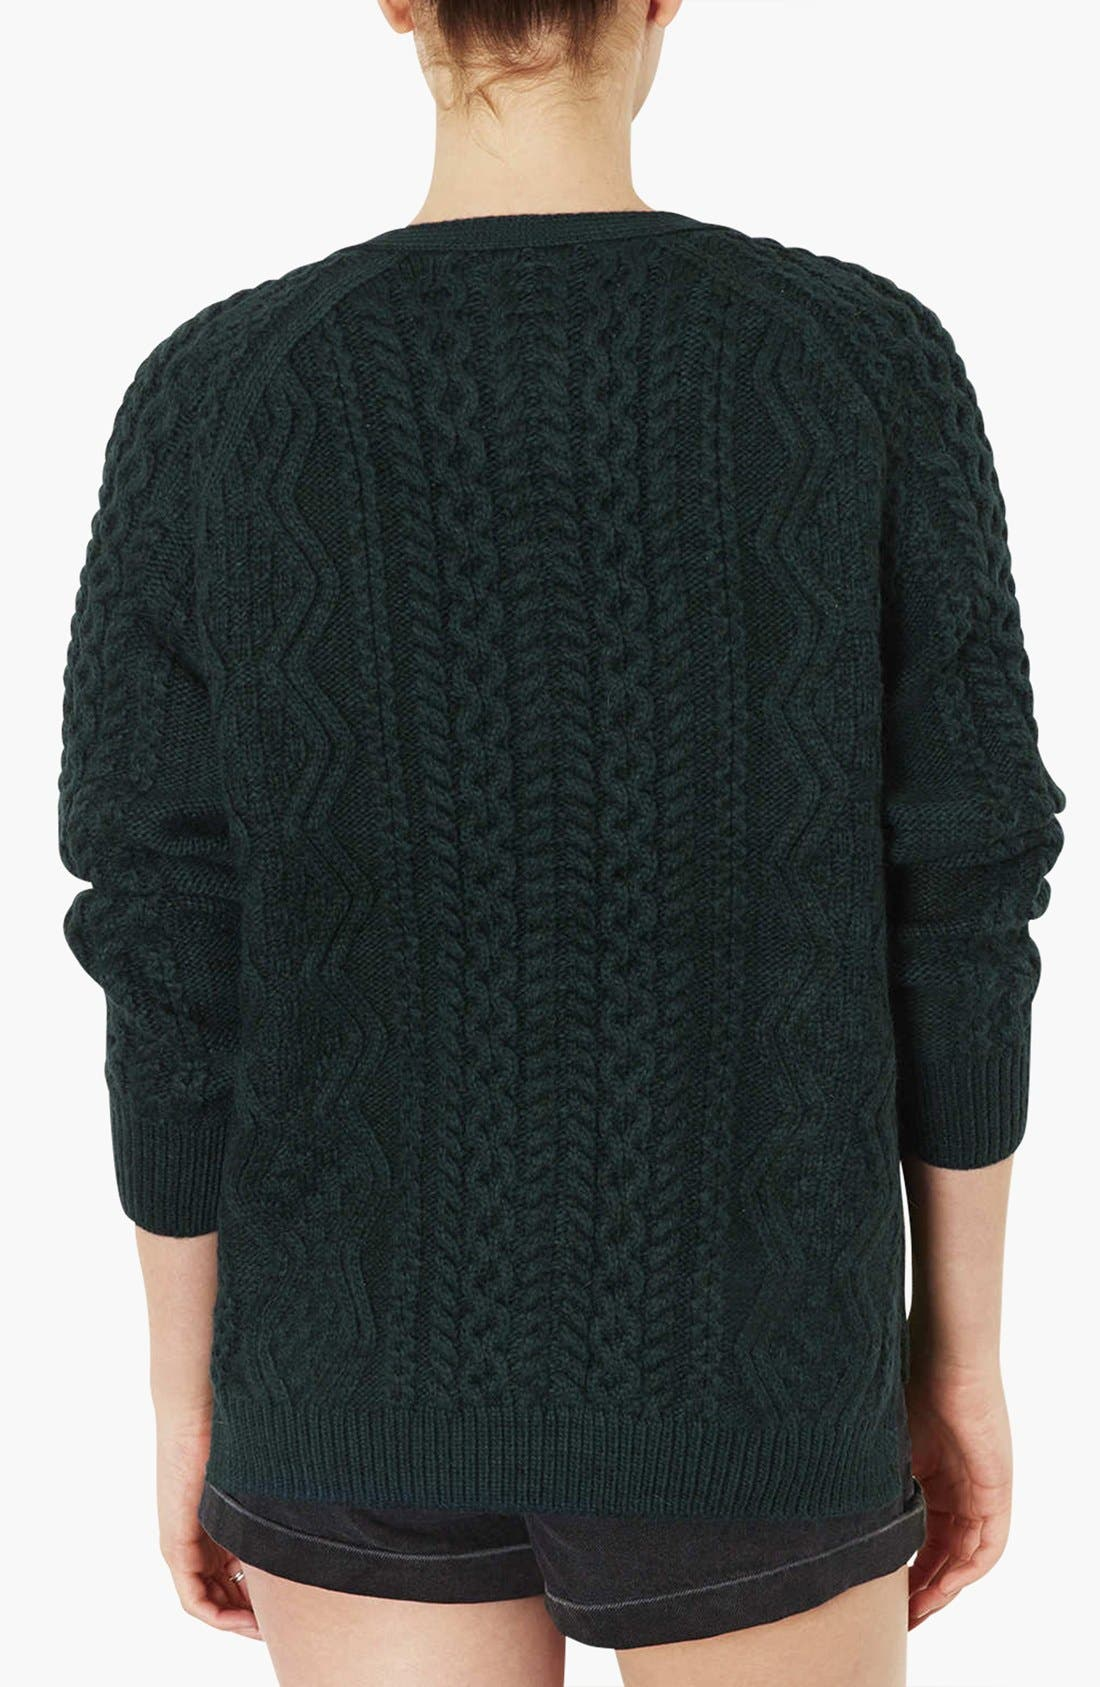 TOPSHOP,                             Cable Knit V-Neck Cardigan,                             Alternate thumbnail 3, color,                             300